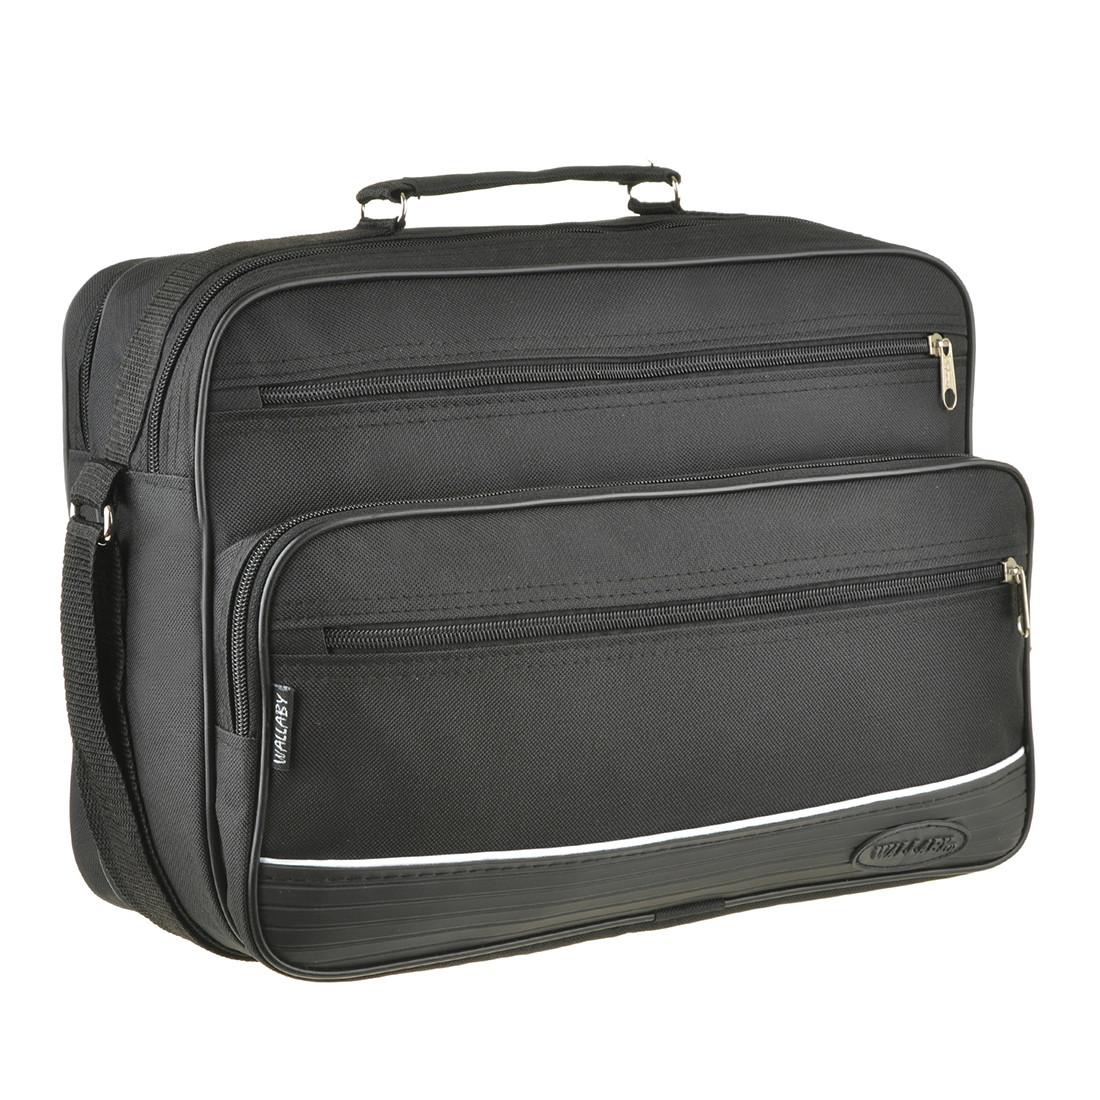 Мужская сумка Wallaby ткань полиестр с ПВХ 36х26х16  тканевая ручка в 2650